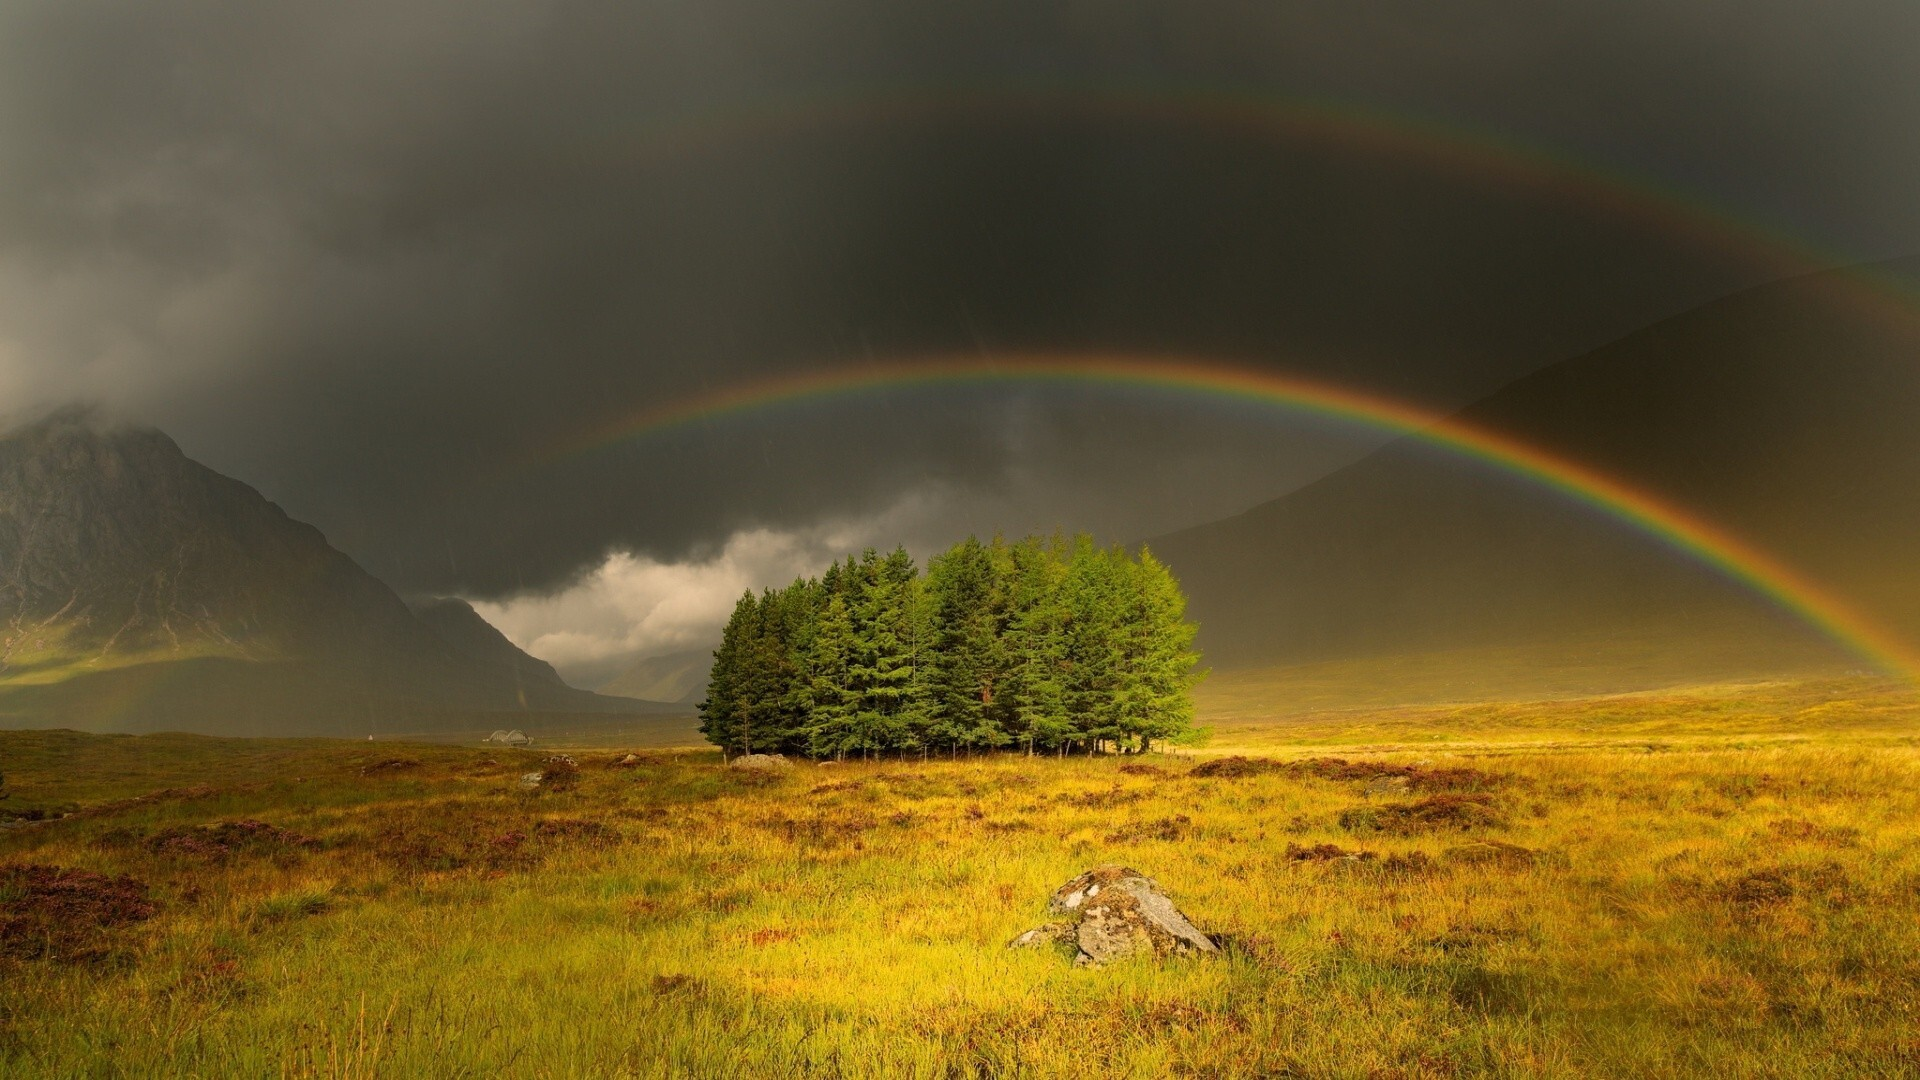 Hd wallpaper rainbow - Rainbow Wallpapers